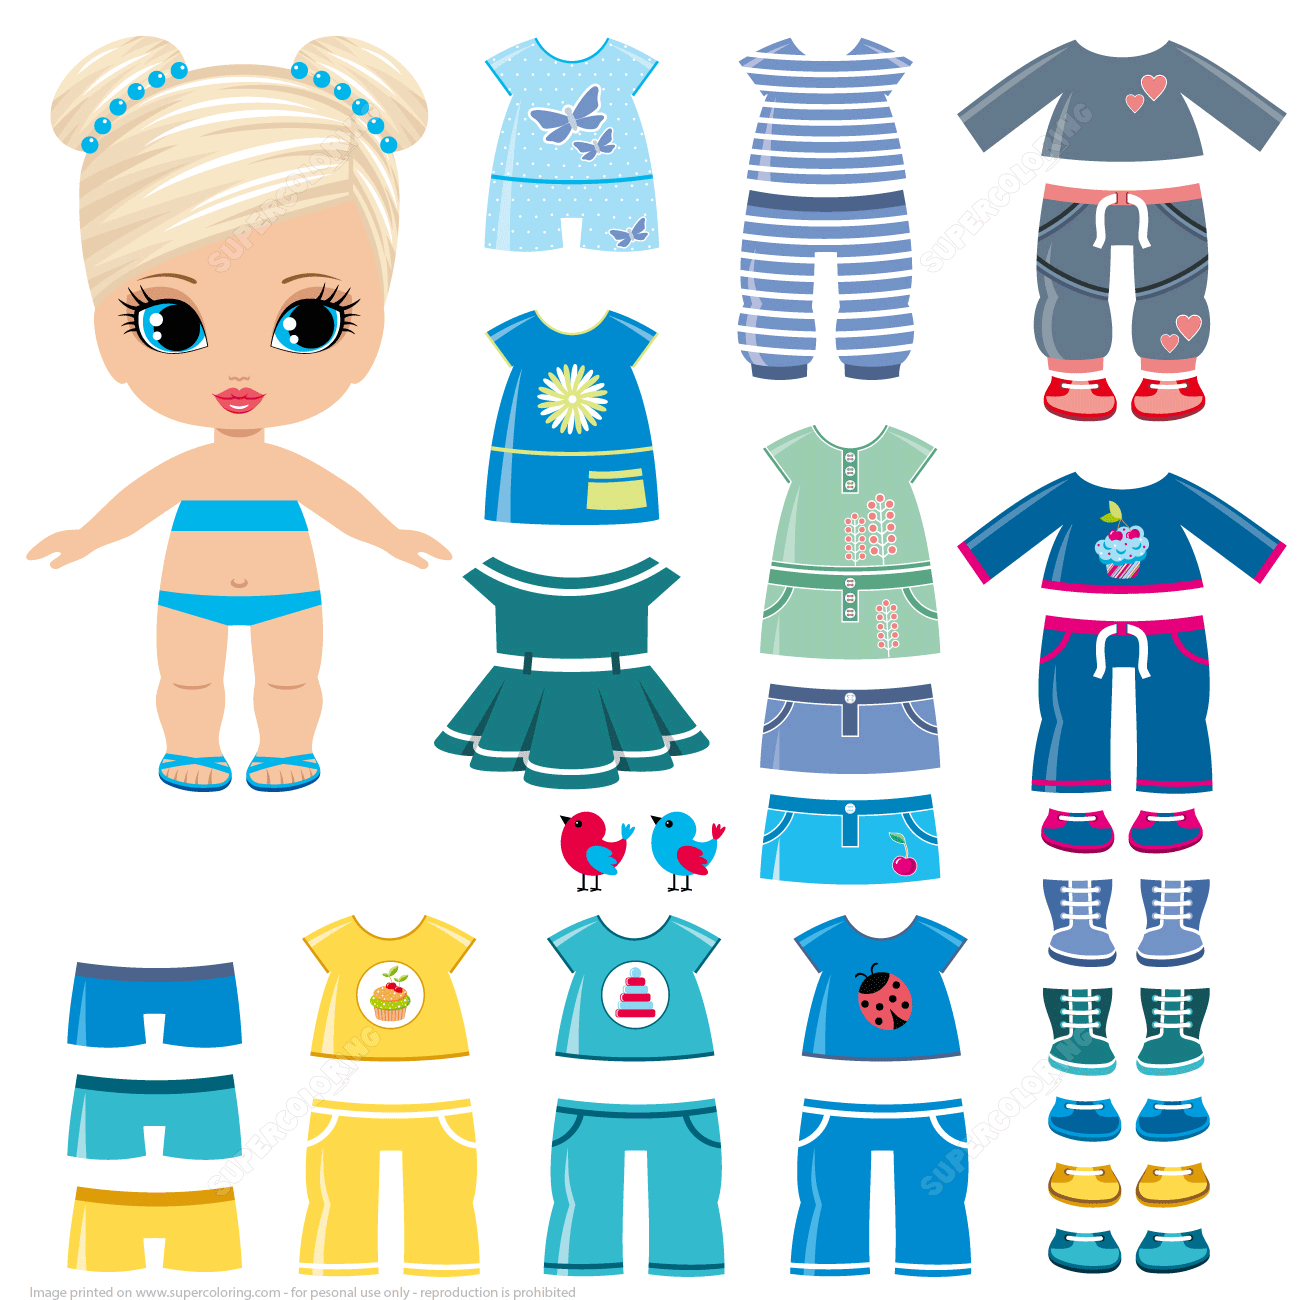 Dress Up Paper Dolls | Free Printable Papercraft Templates - Free Printable Dress Up Paper Dolls